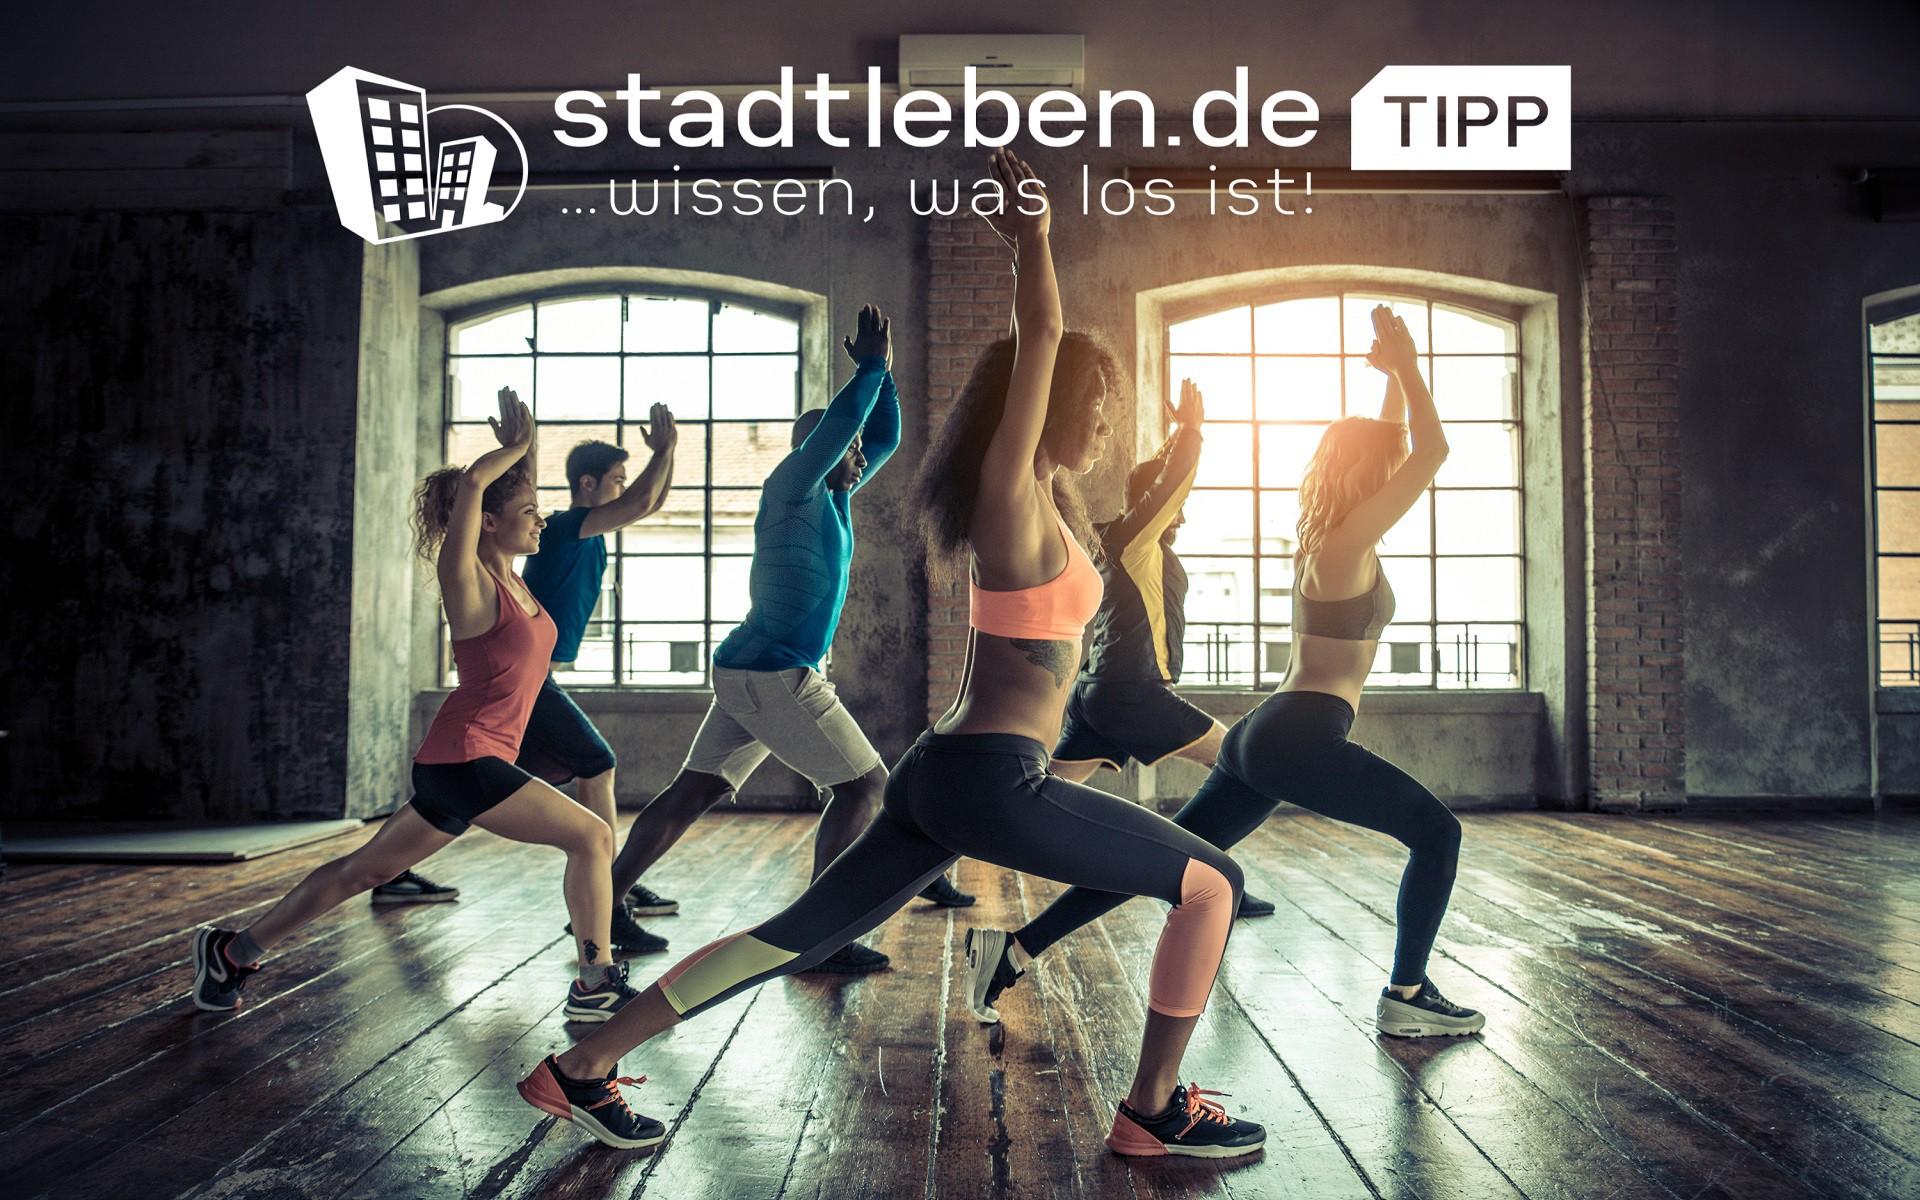 Fitnesscenter, Lokation, Sportbekleidung, Fitnessgeräte, Wasserflasche, Fitness